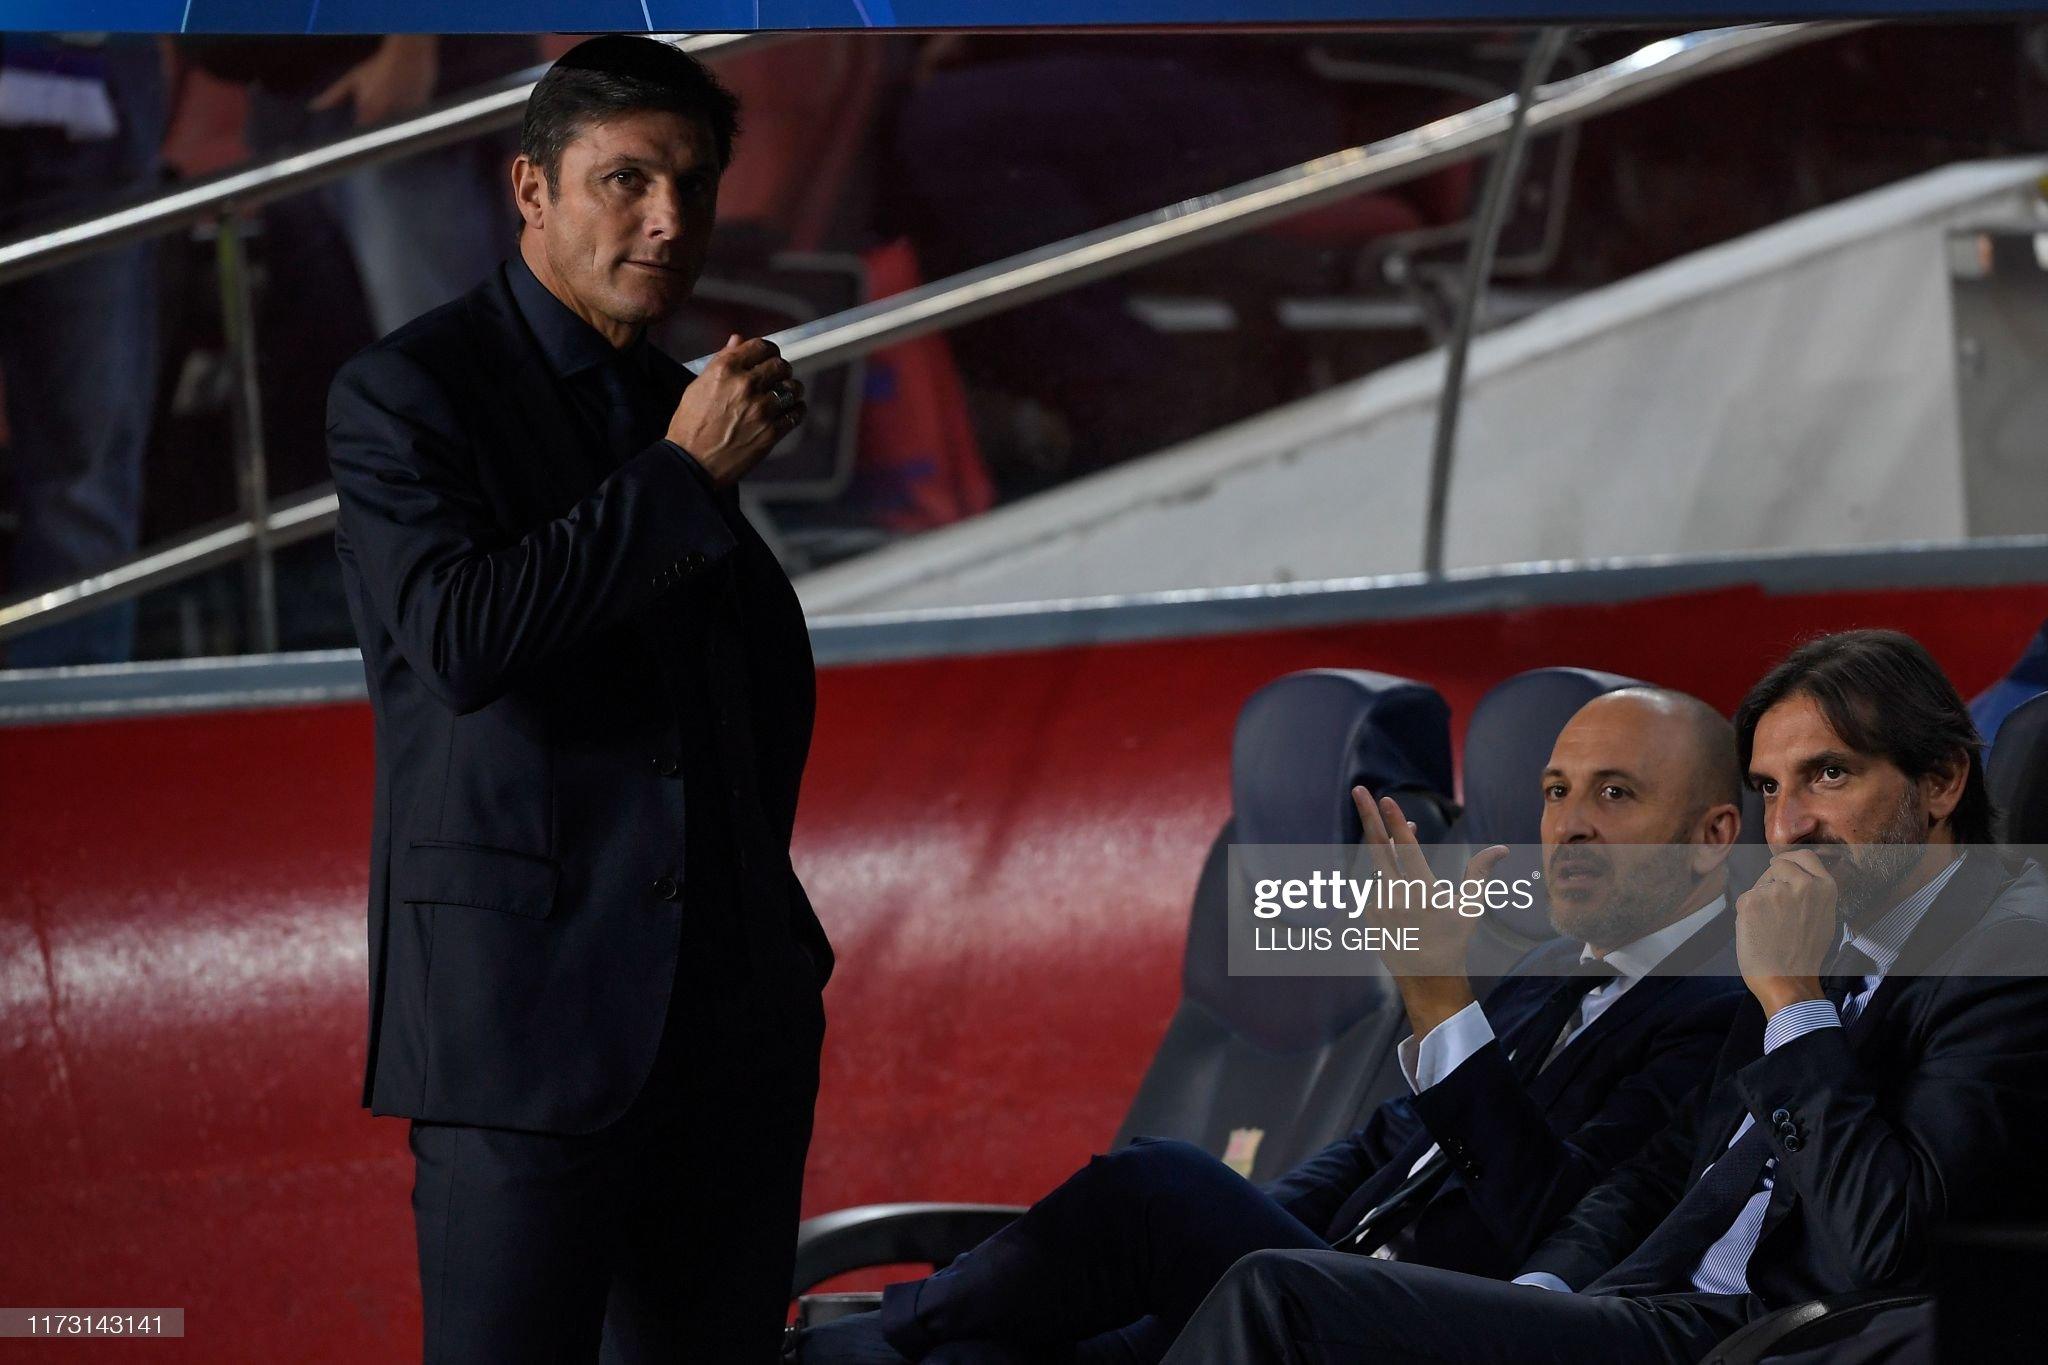 صور مباراة : برشلونة - إنتر 2-1 ( 02-10-2019 )  Argentine-former-footballer-and-current-vicepresident-of-inter-milan-picture-id1173143141?s=2048x2048